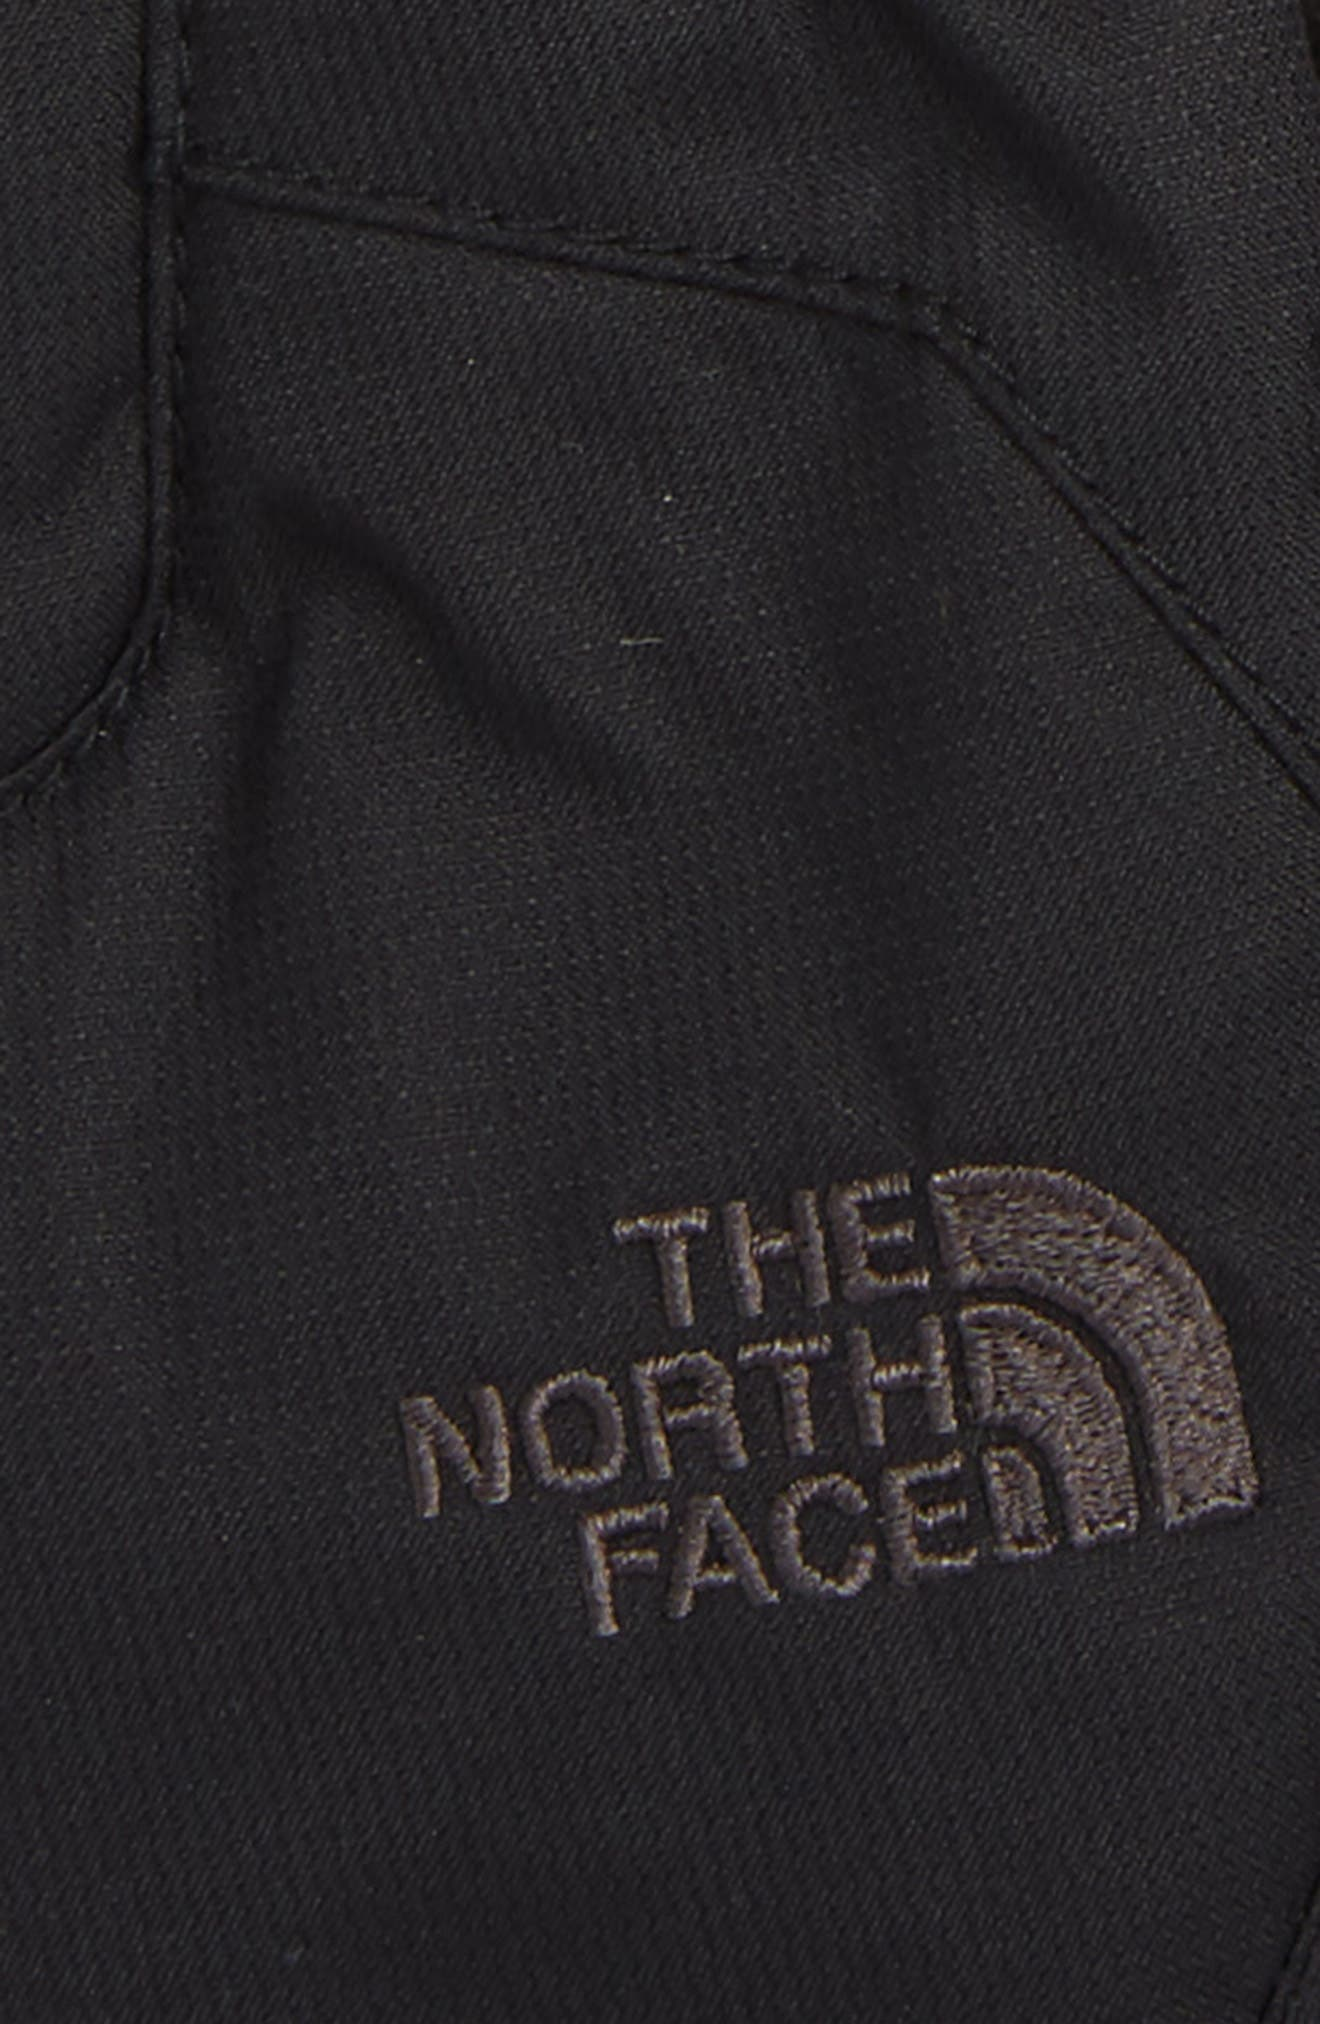 Alternate Image 2  - The North Face Heatseeker™ Insulated Mittens (Toddler Kids)